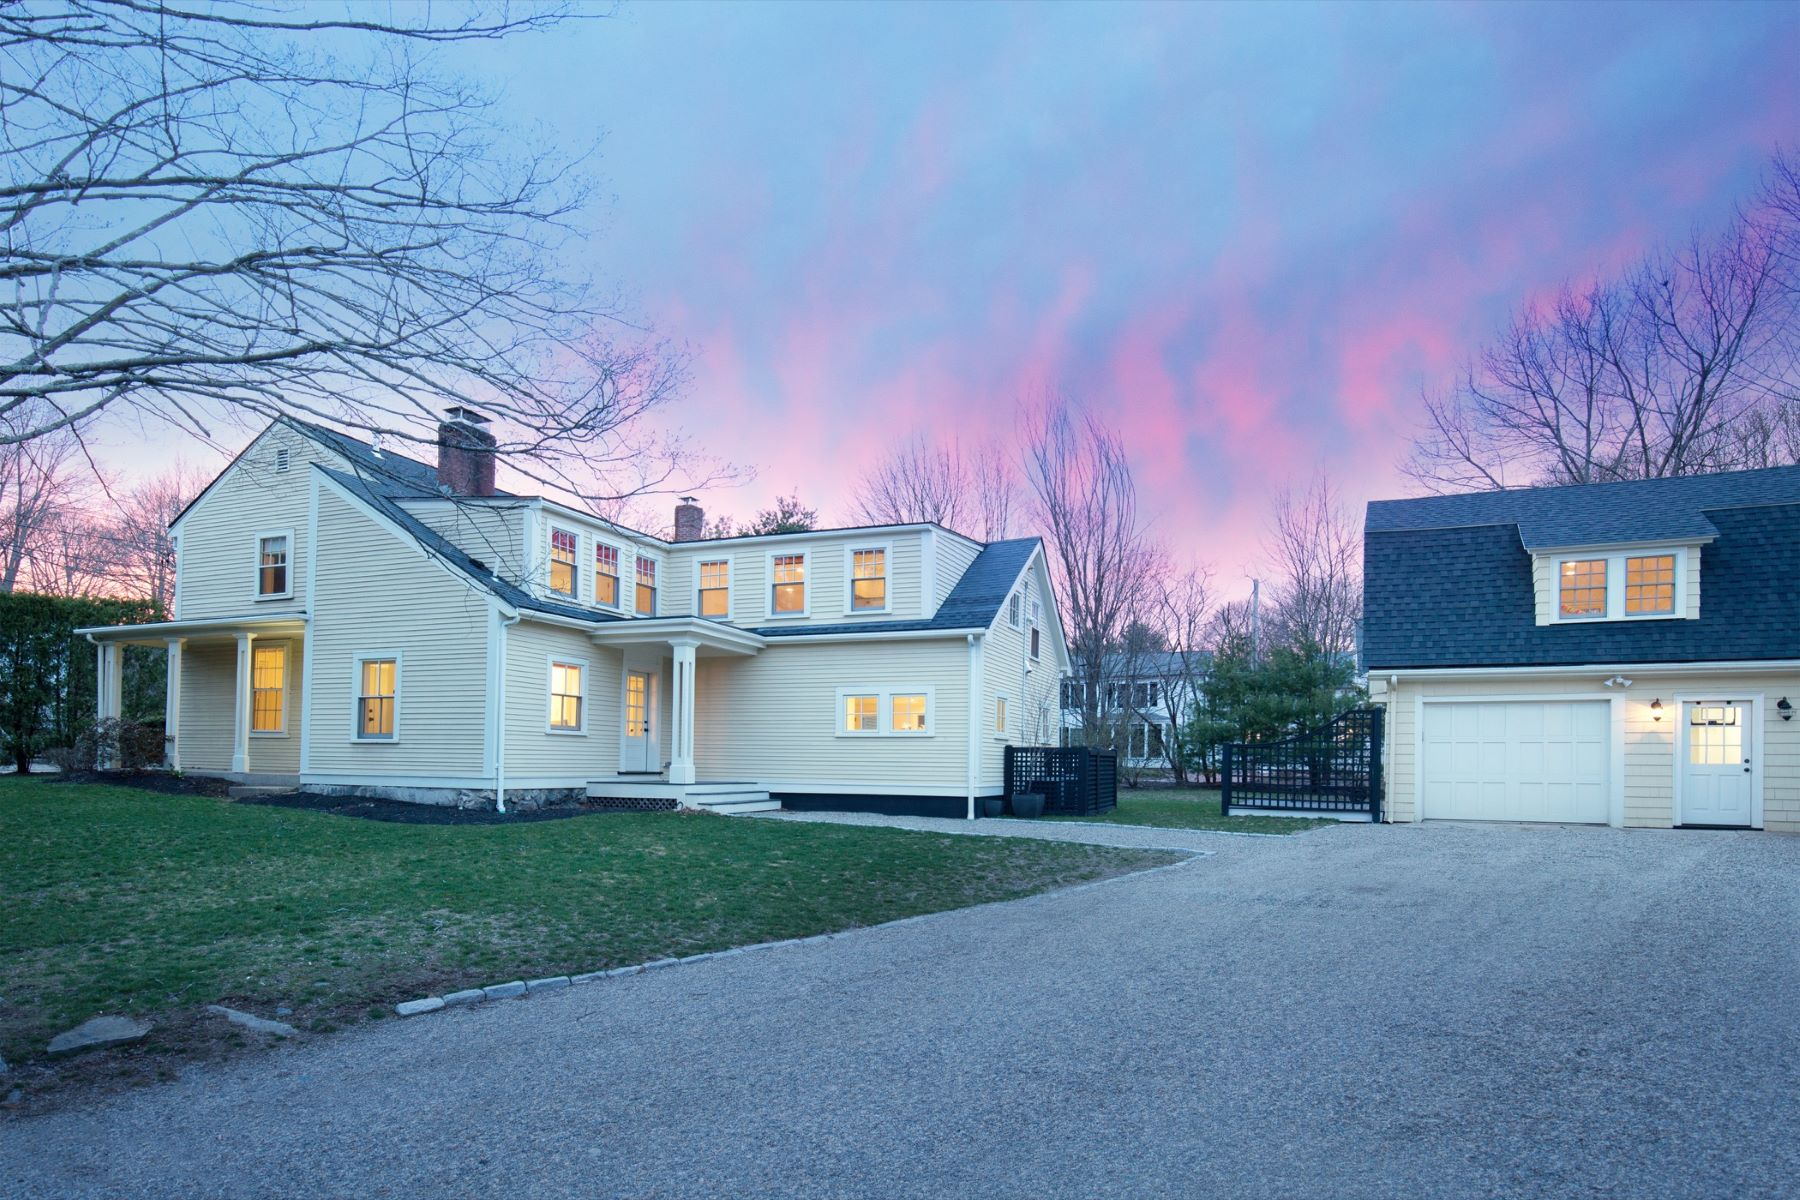 Moradia Multi-familiar para Venda às Stunning Scandinavian Design Home 881 Massachusetts Ave Lexington, Massachusetts, 02420 Estados Unidos